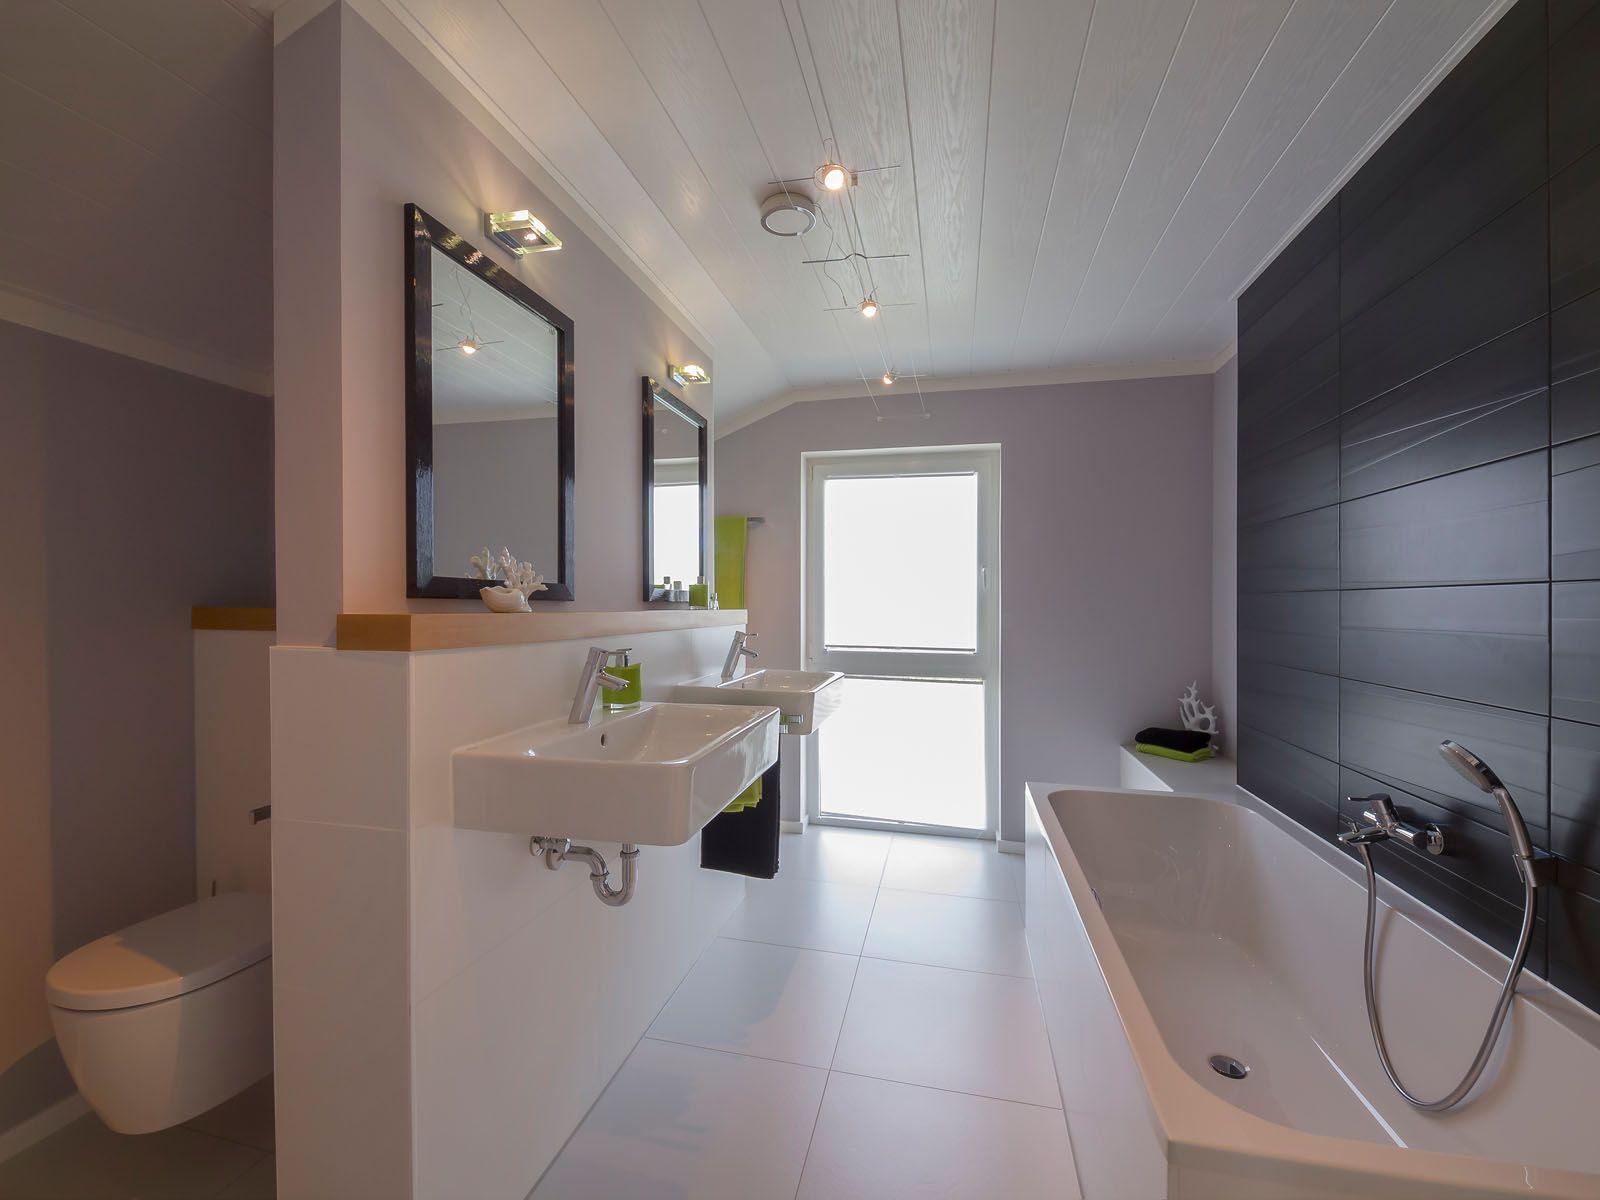 Farbideen Badezimmer ~ Farbe badezimmer grün holz waschtischunterschrank walk in dusche